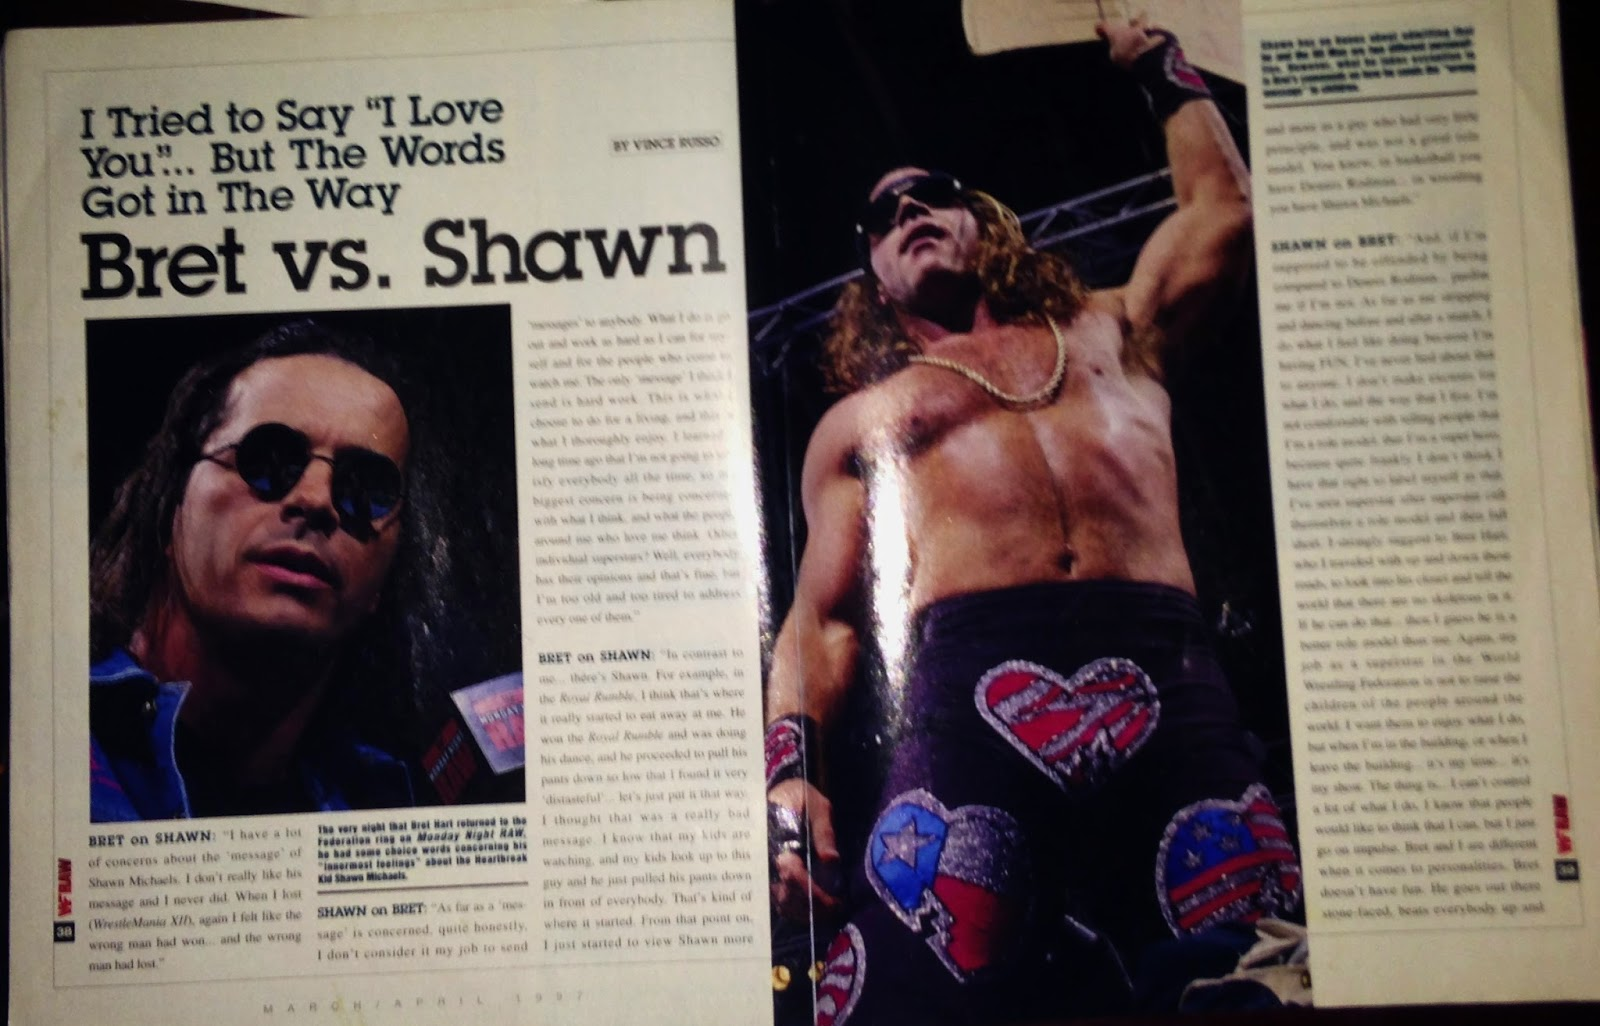 WWE - WWF RAW MAGAZINE 1997: Bret vs. Shawn war of words